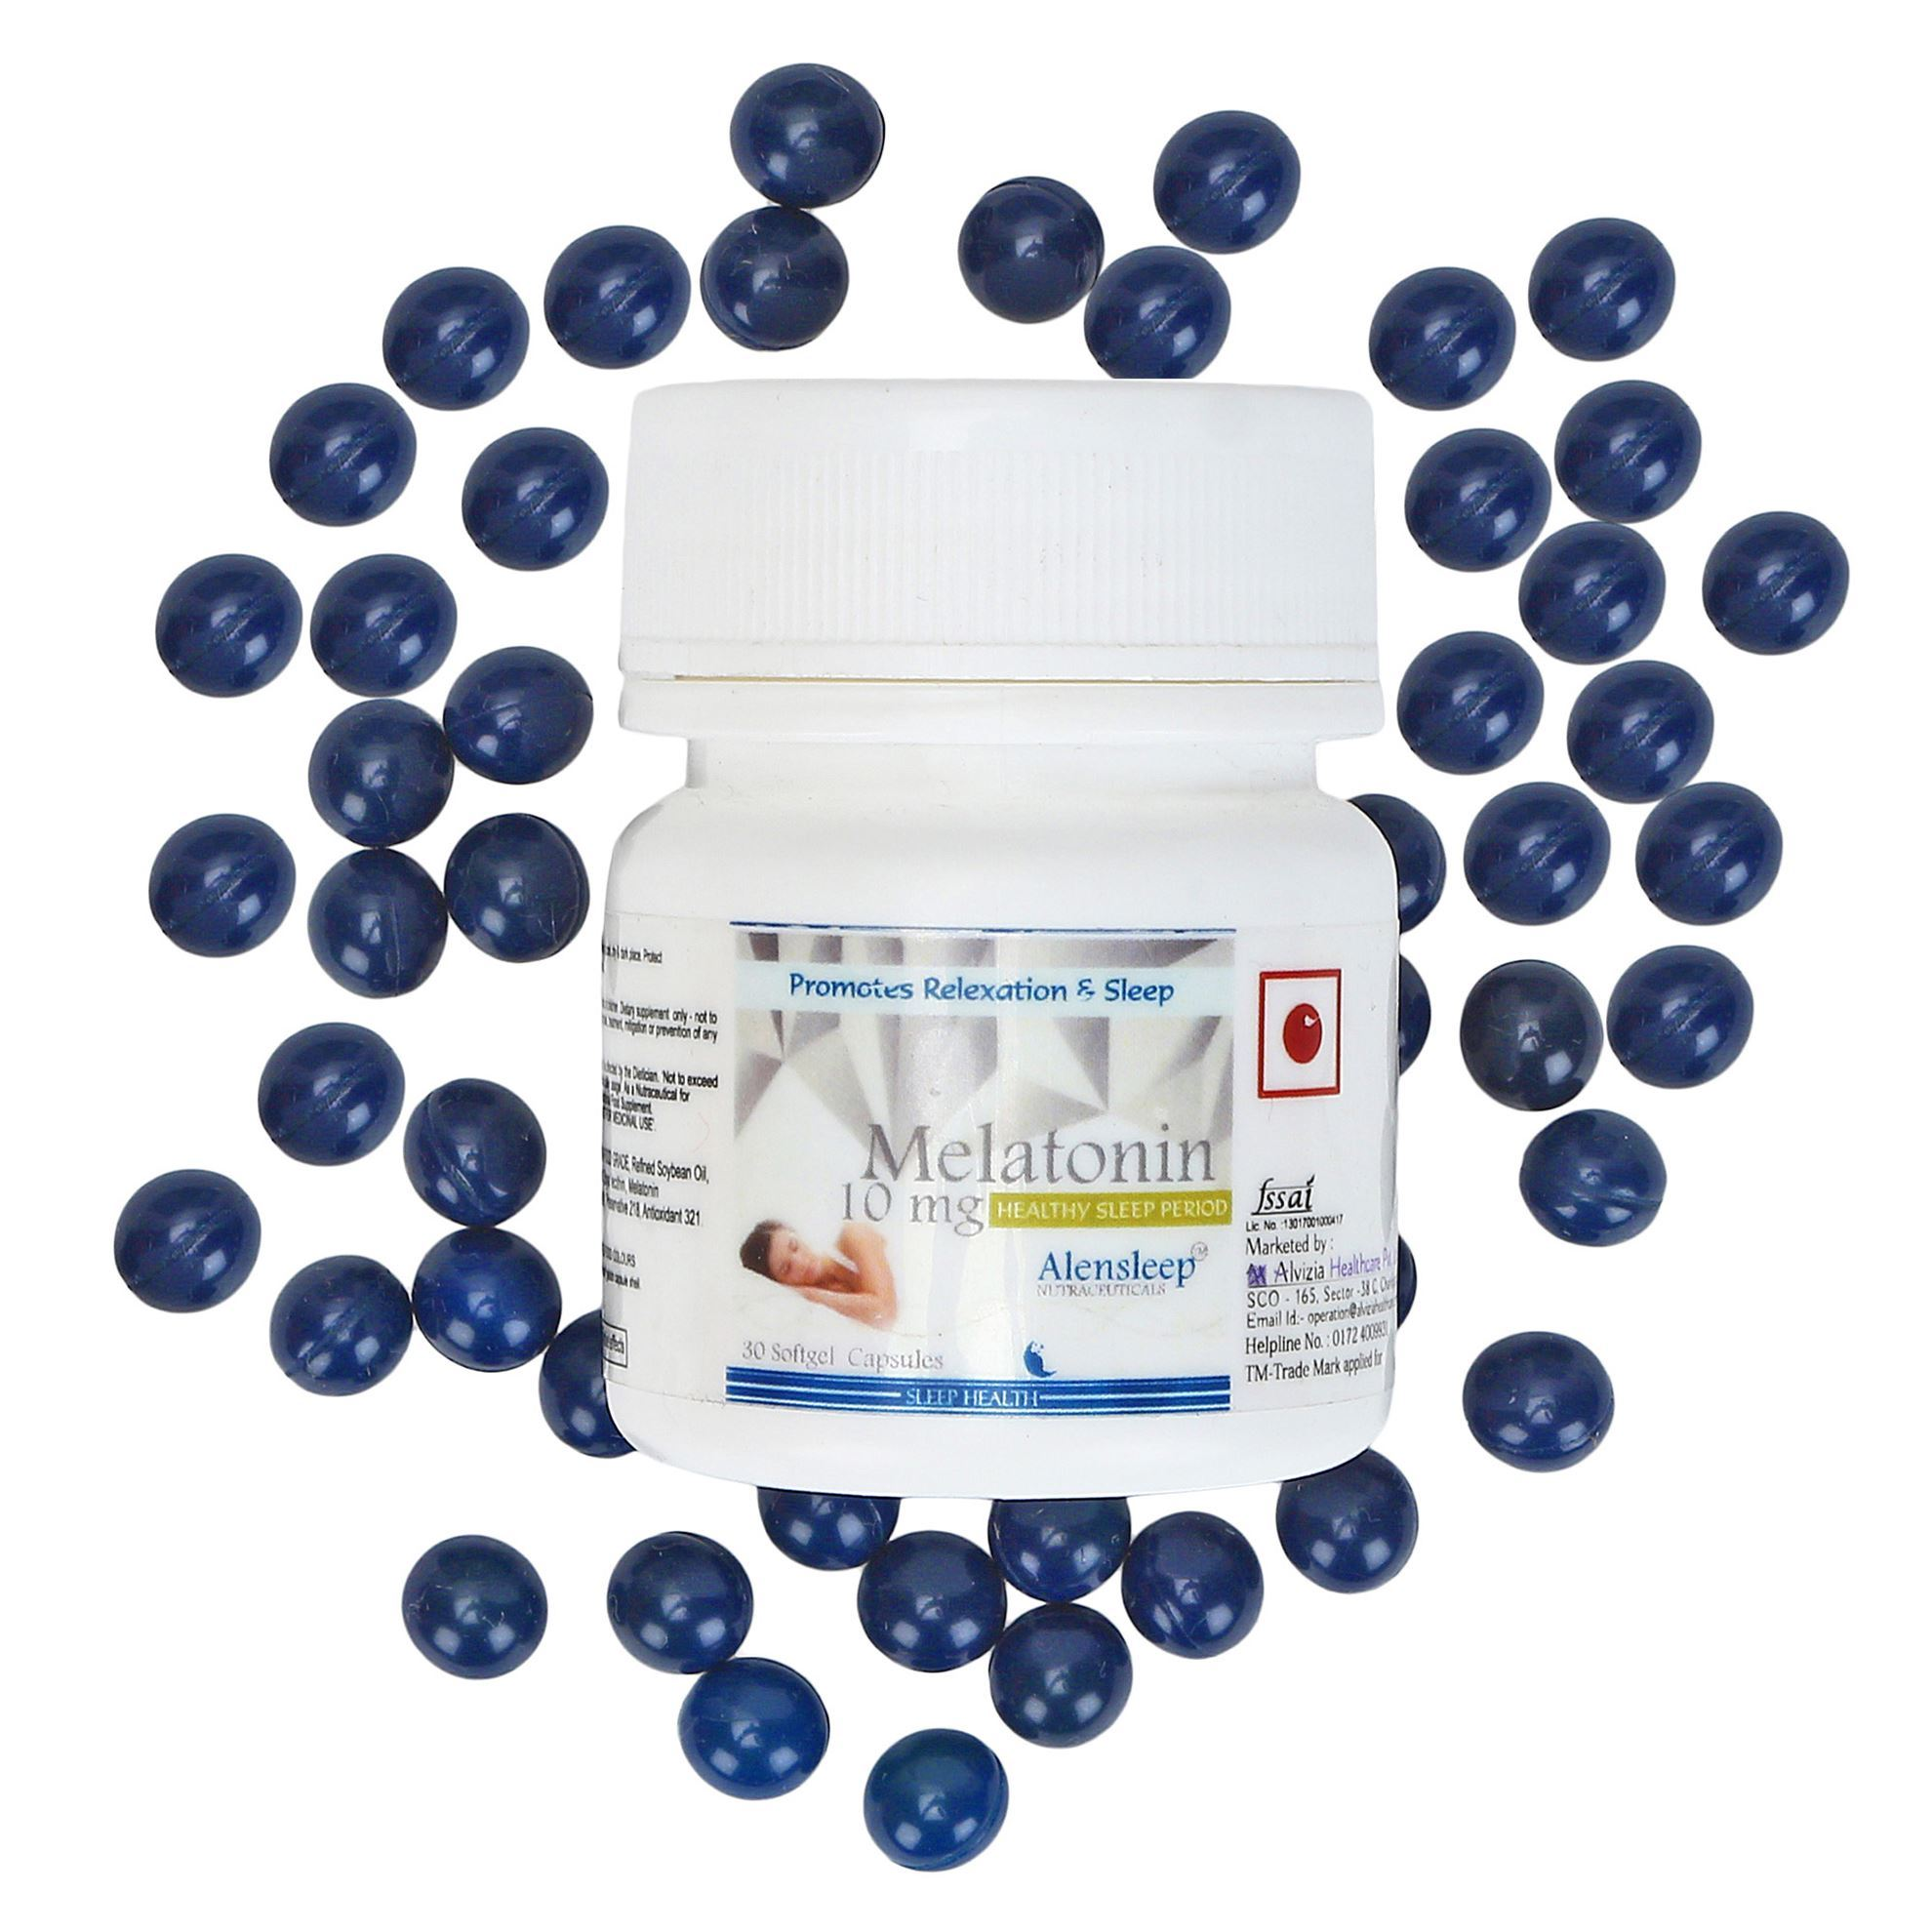 Picture of Alvizia Melatonin 10 mg Softgel 30 Capsules